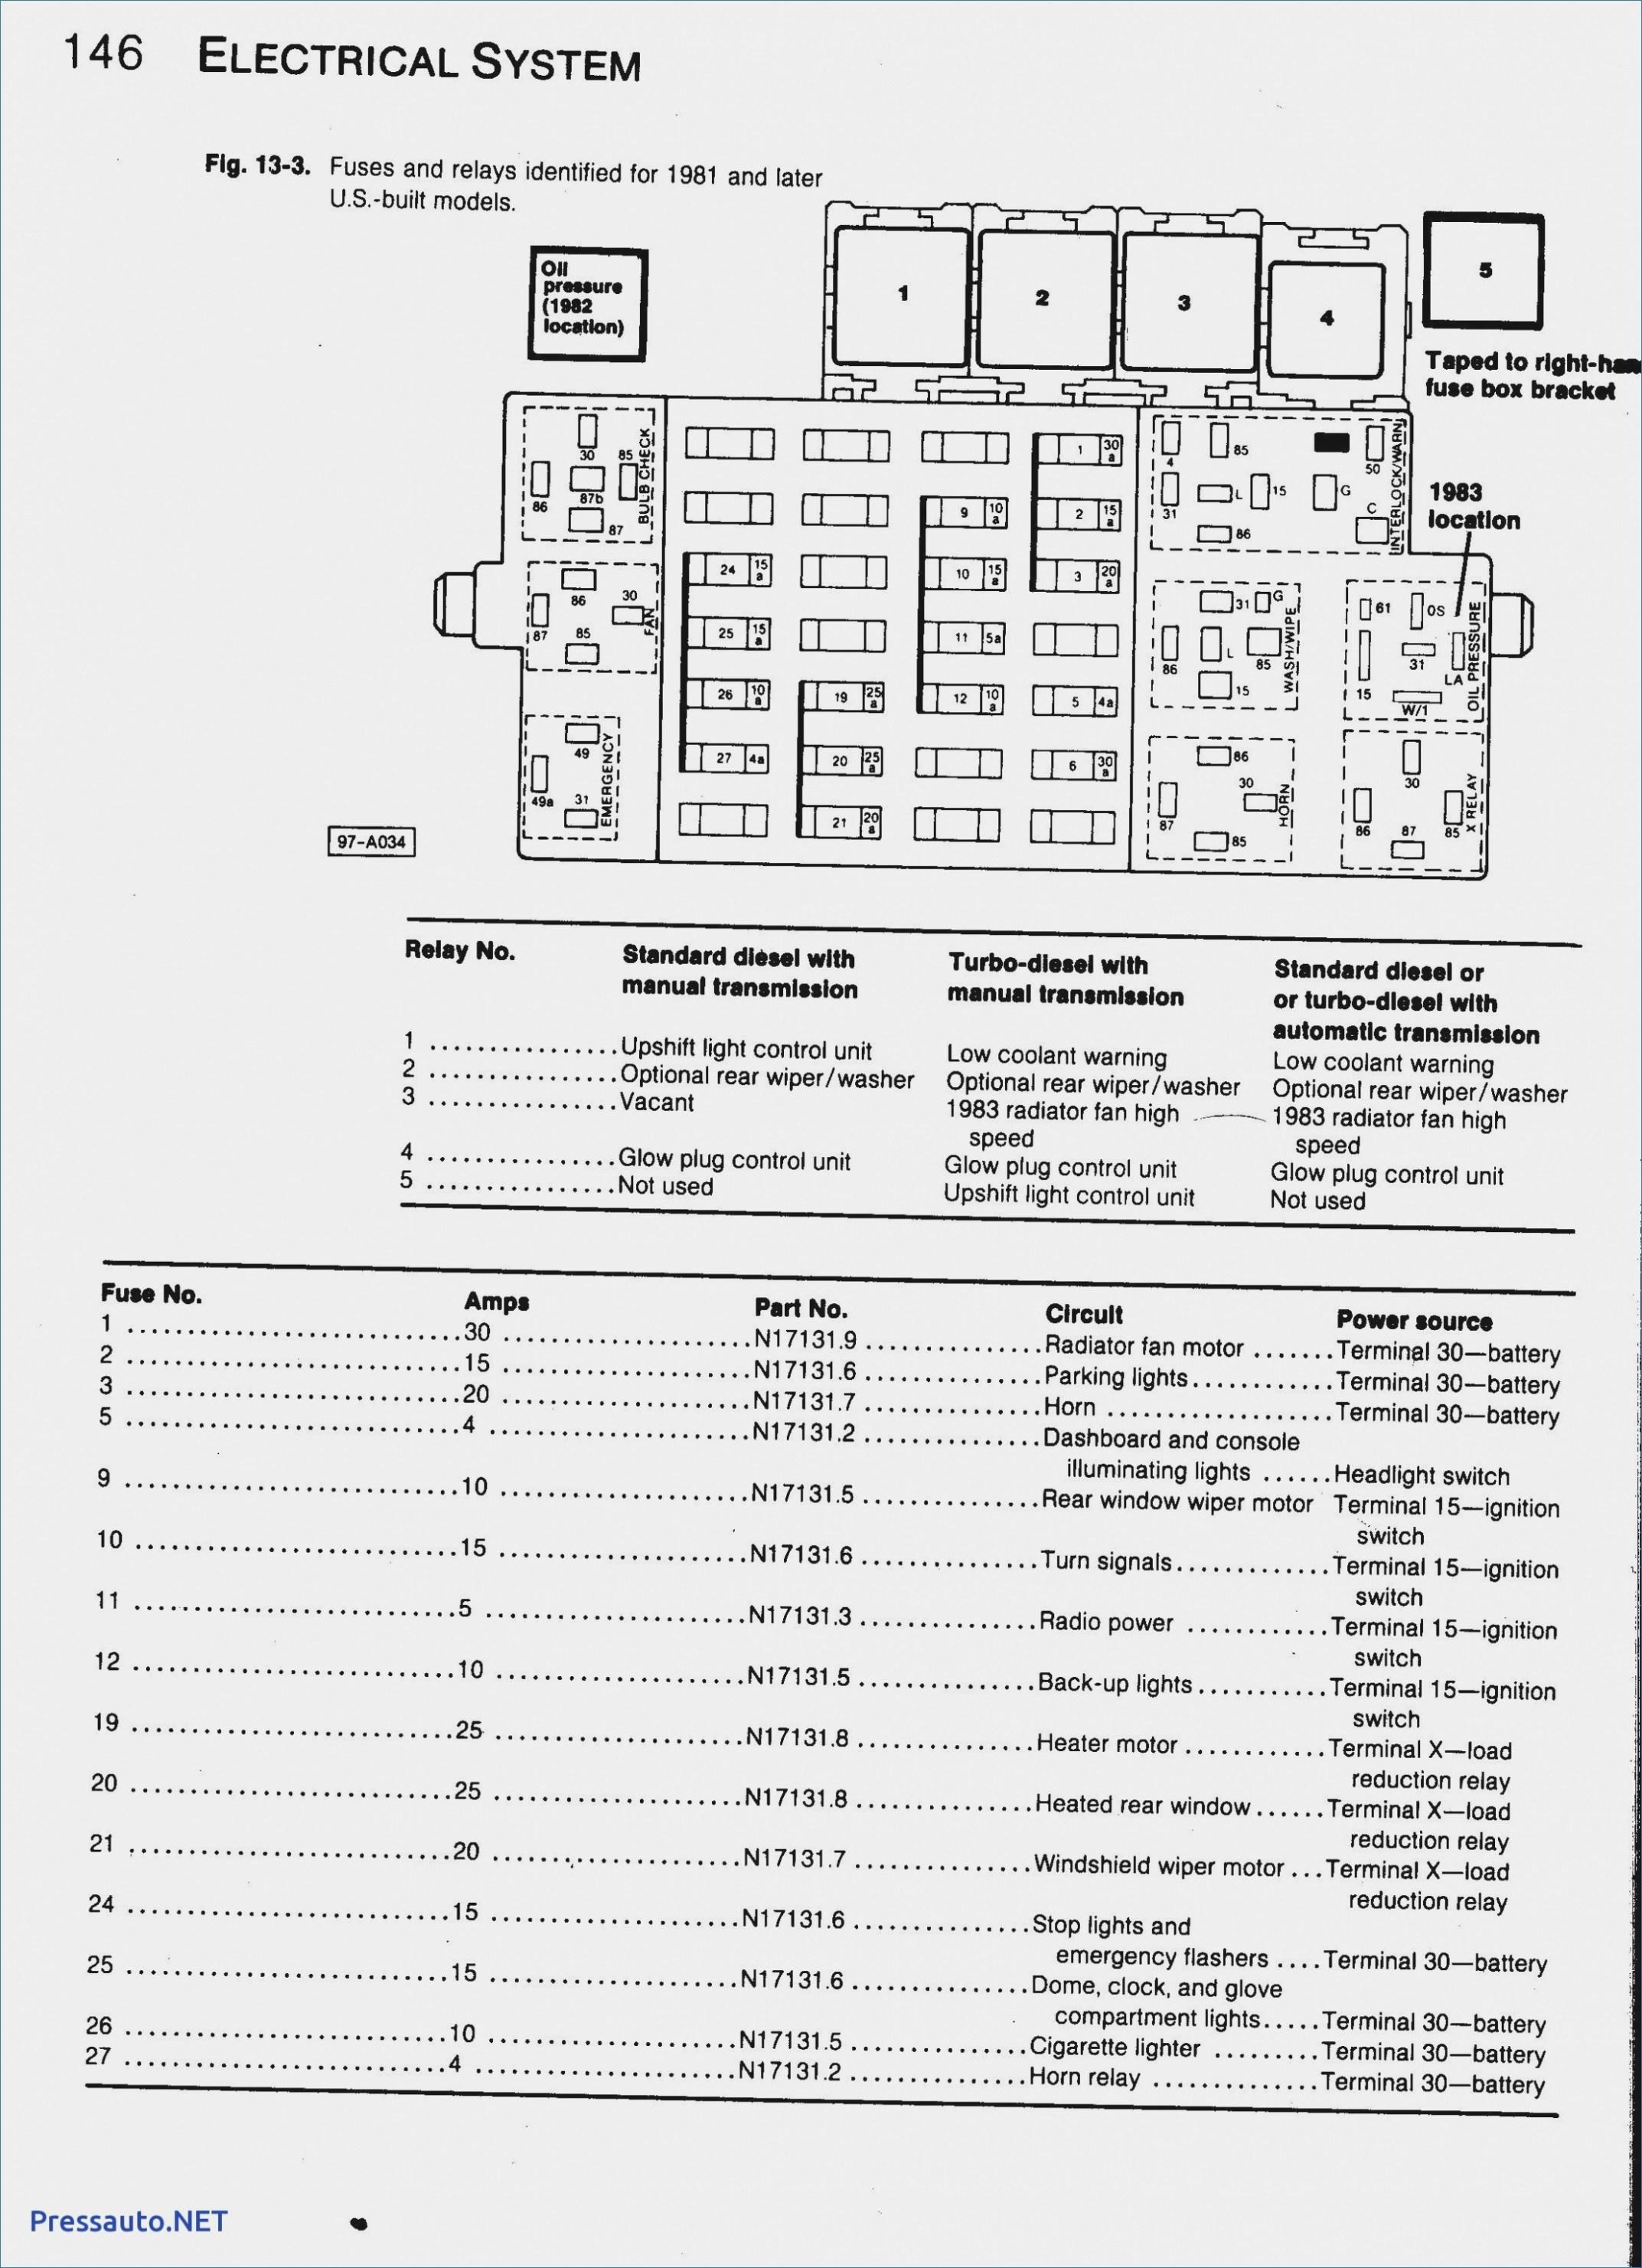 2008 Vw Jetta Fuse Box Diagram 2008 Jetta Fuse Box Diagram Today Diagram Database